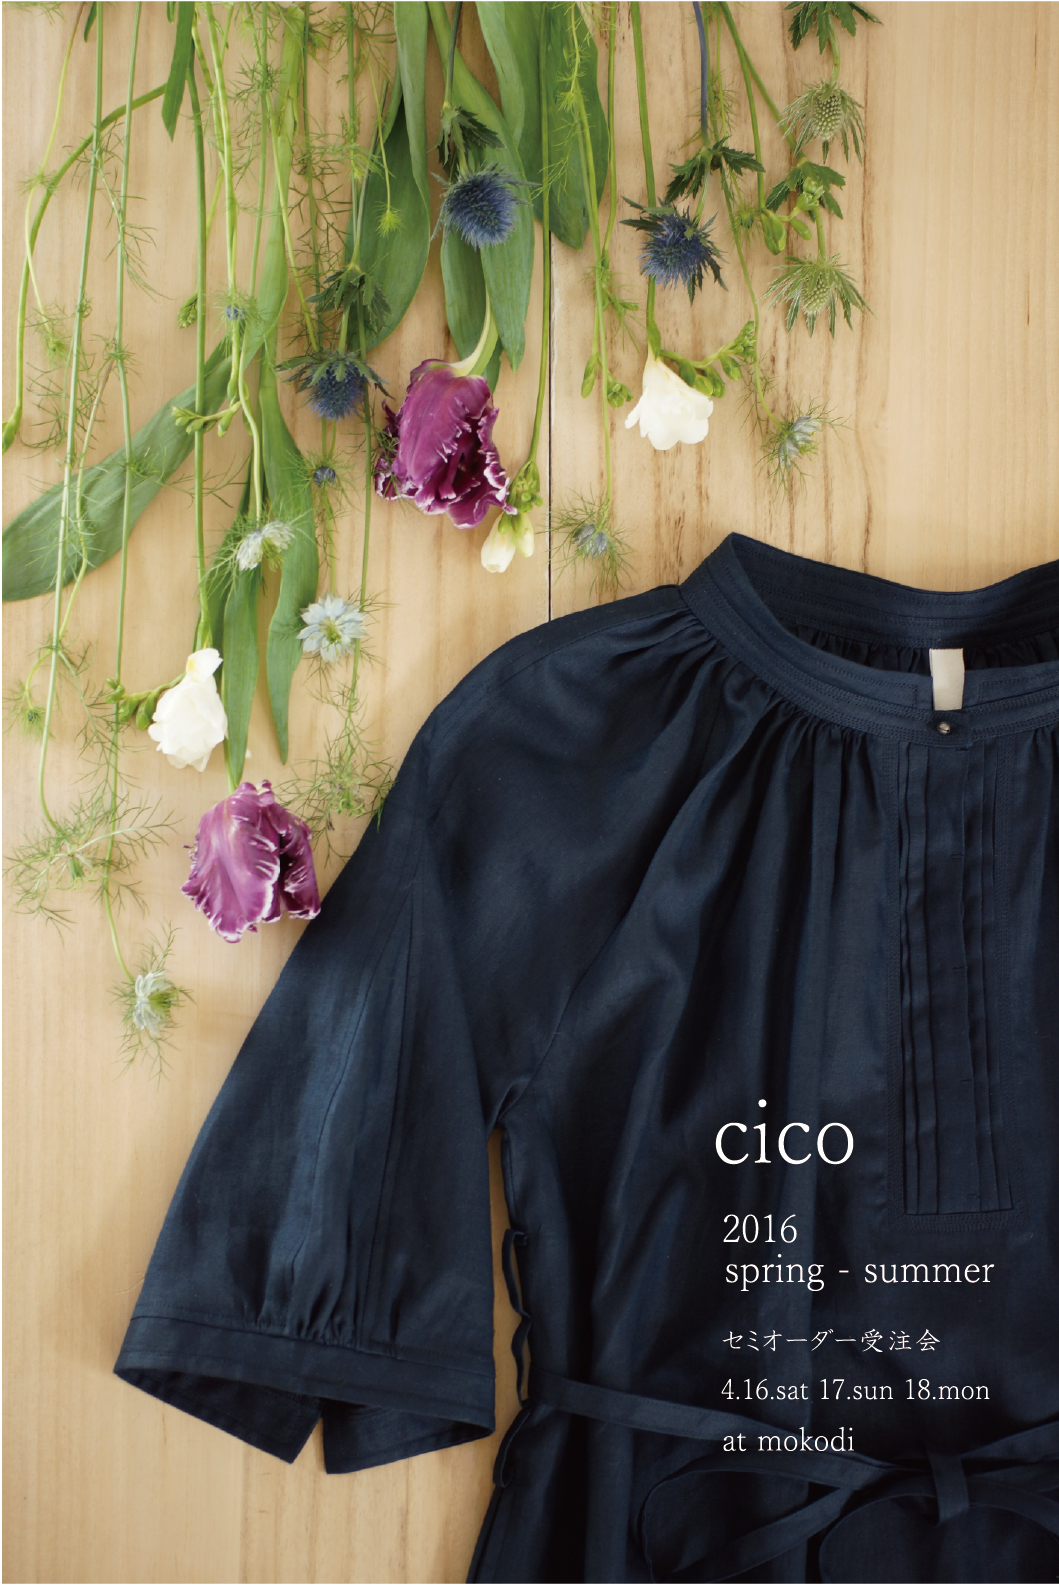 cico セミオーダー受注会 2016 spring-summer 2016.4.16~